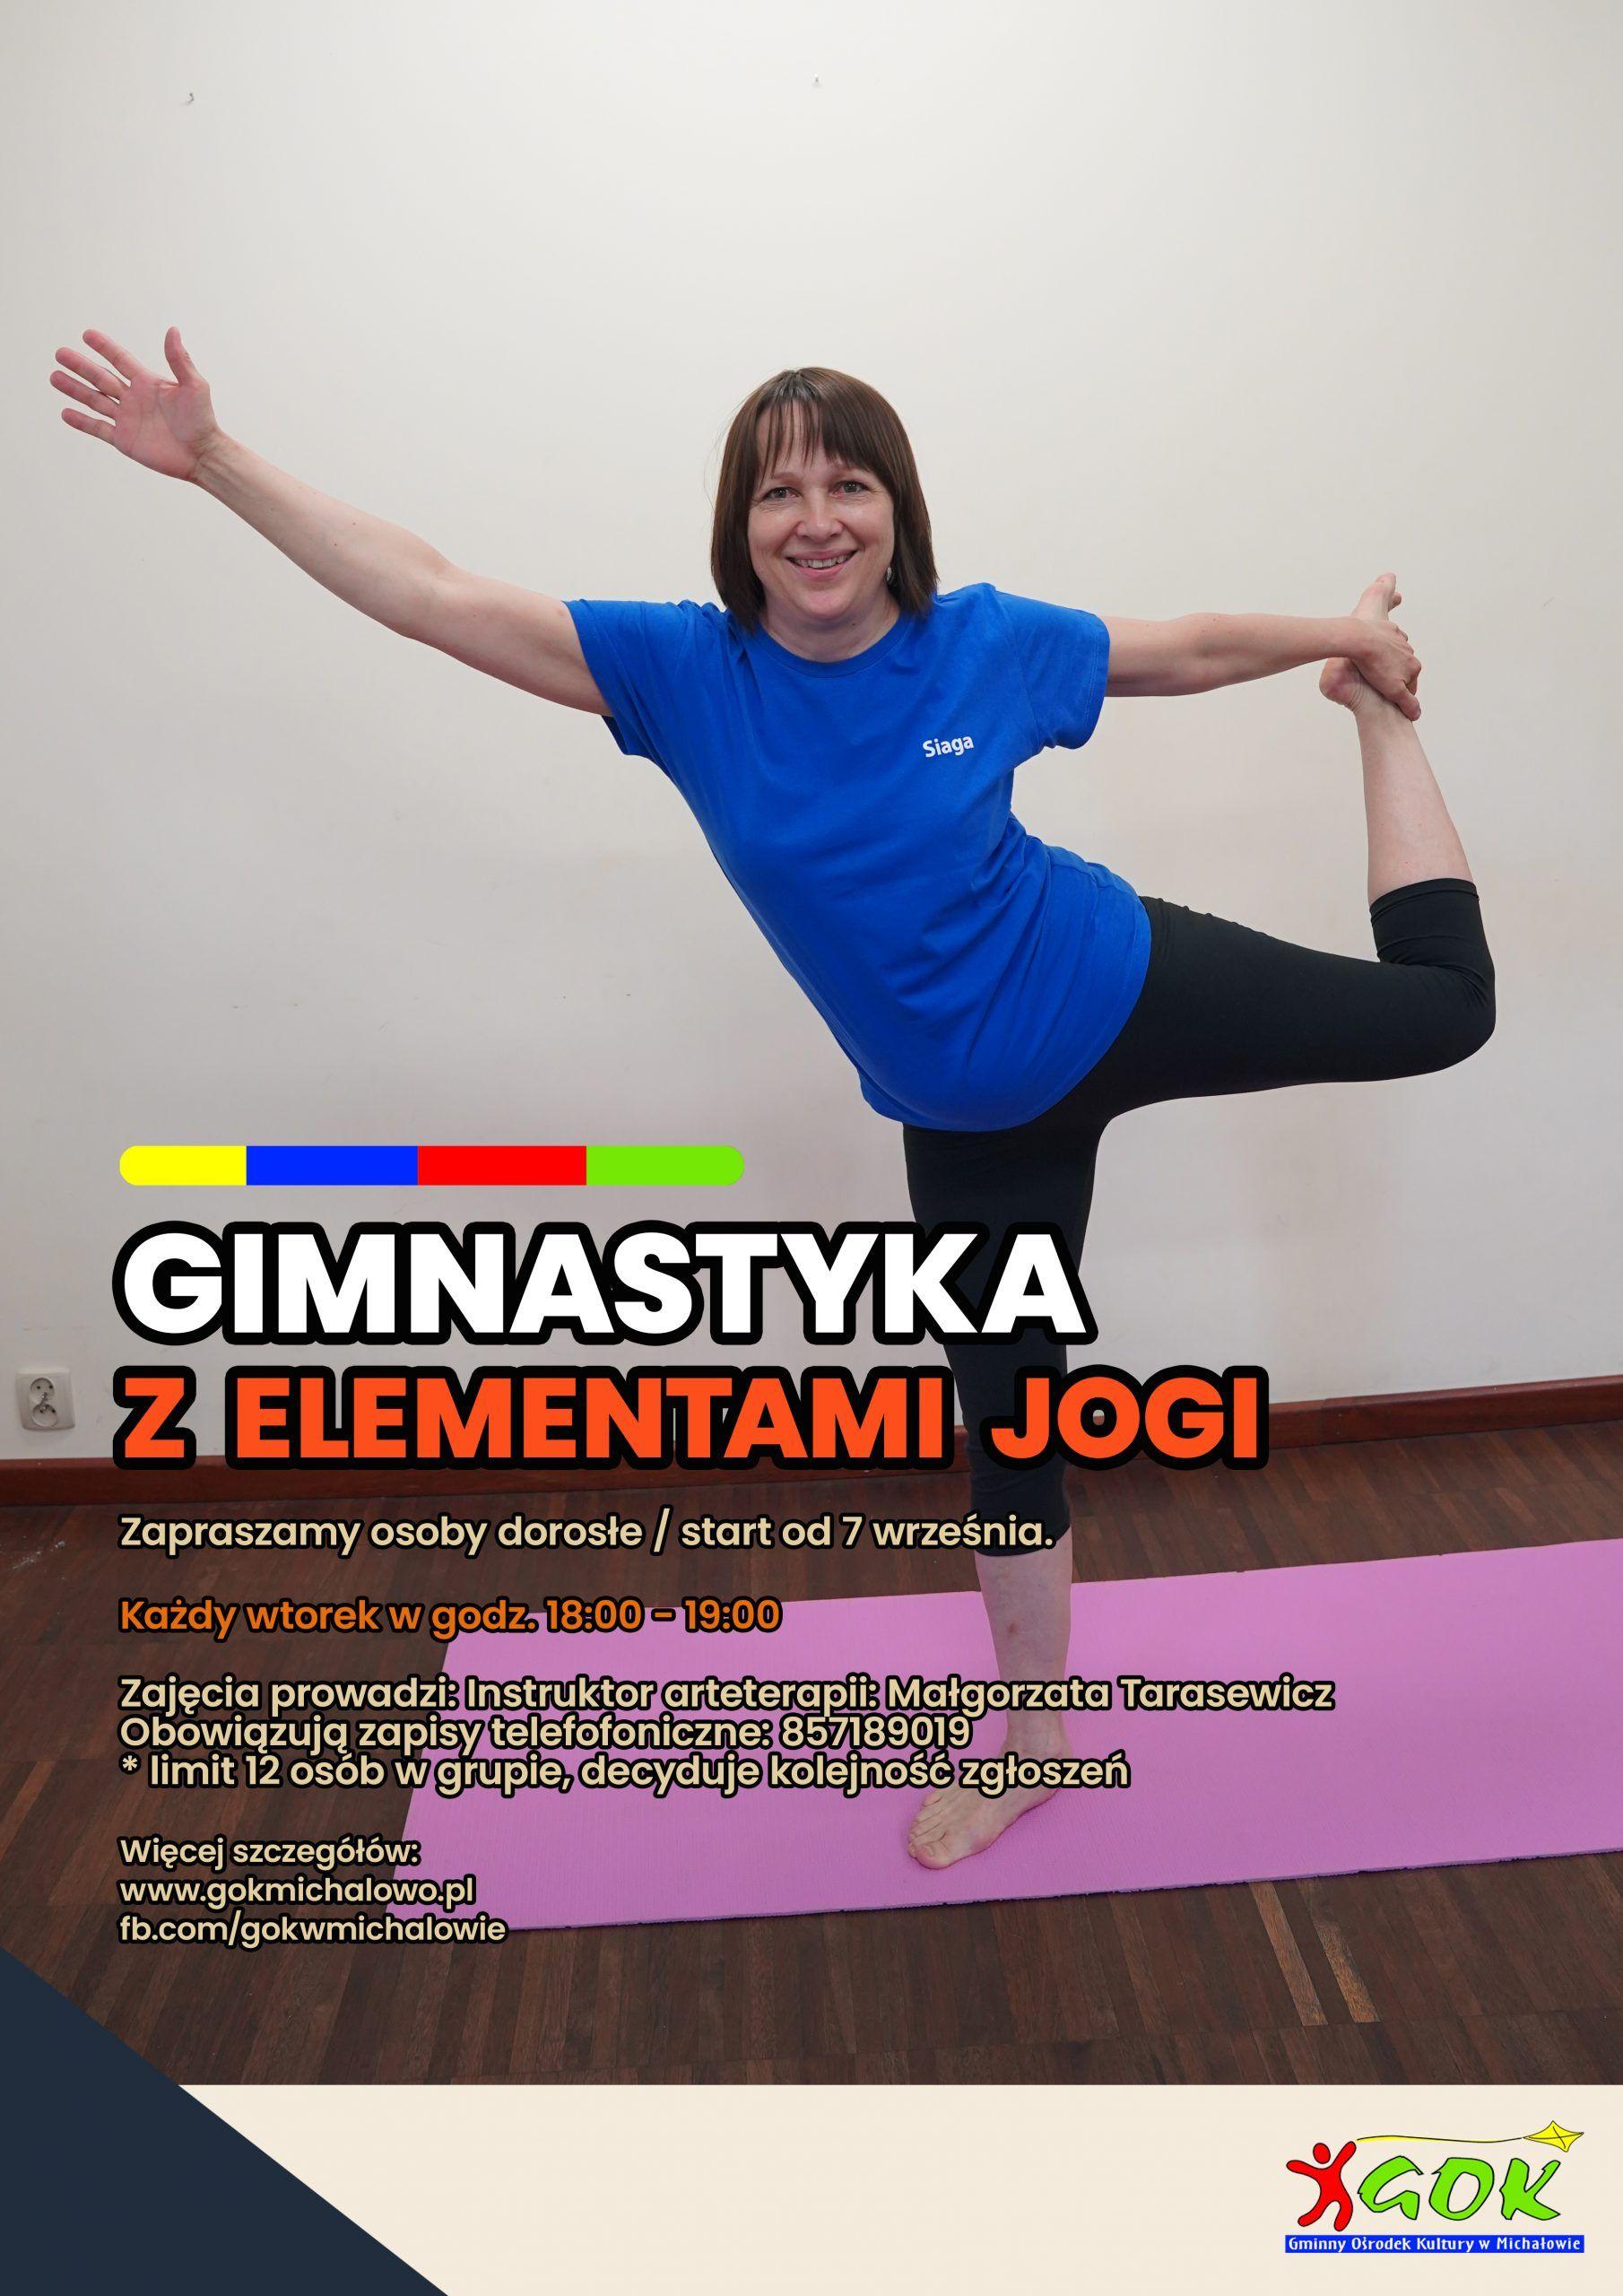 GOK_joga_siaga_plakat_2021